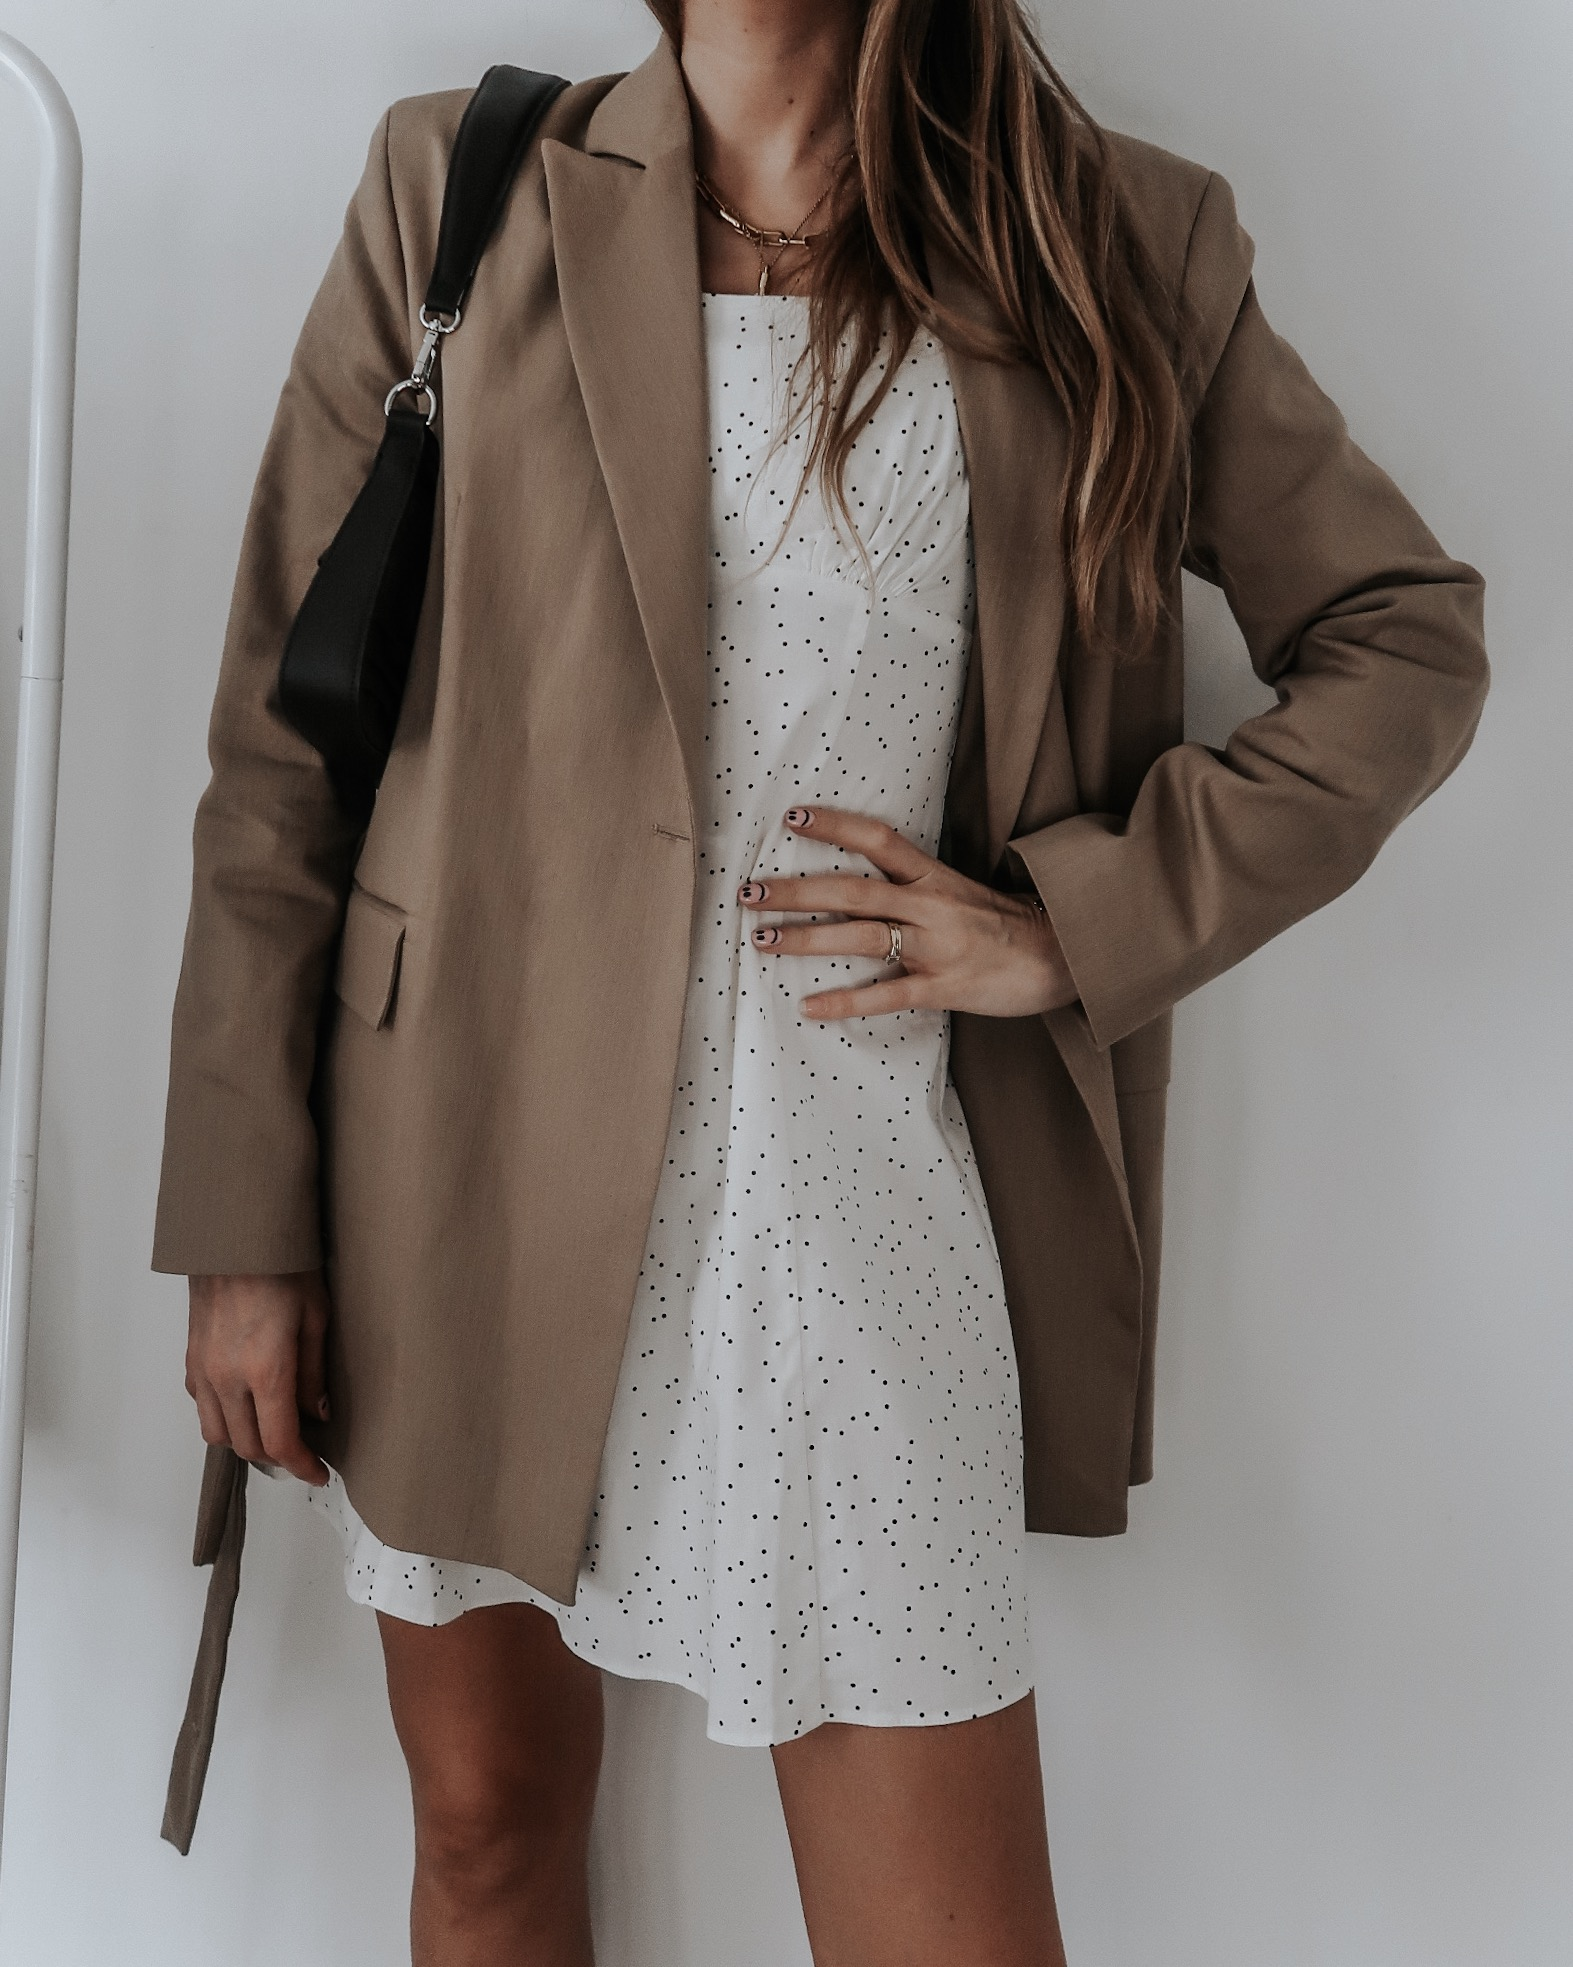 Sinead Crowe Fashion Favourites - Topshop Tan Blazer - Spring Outfit Idea